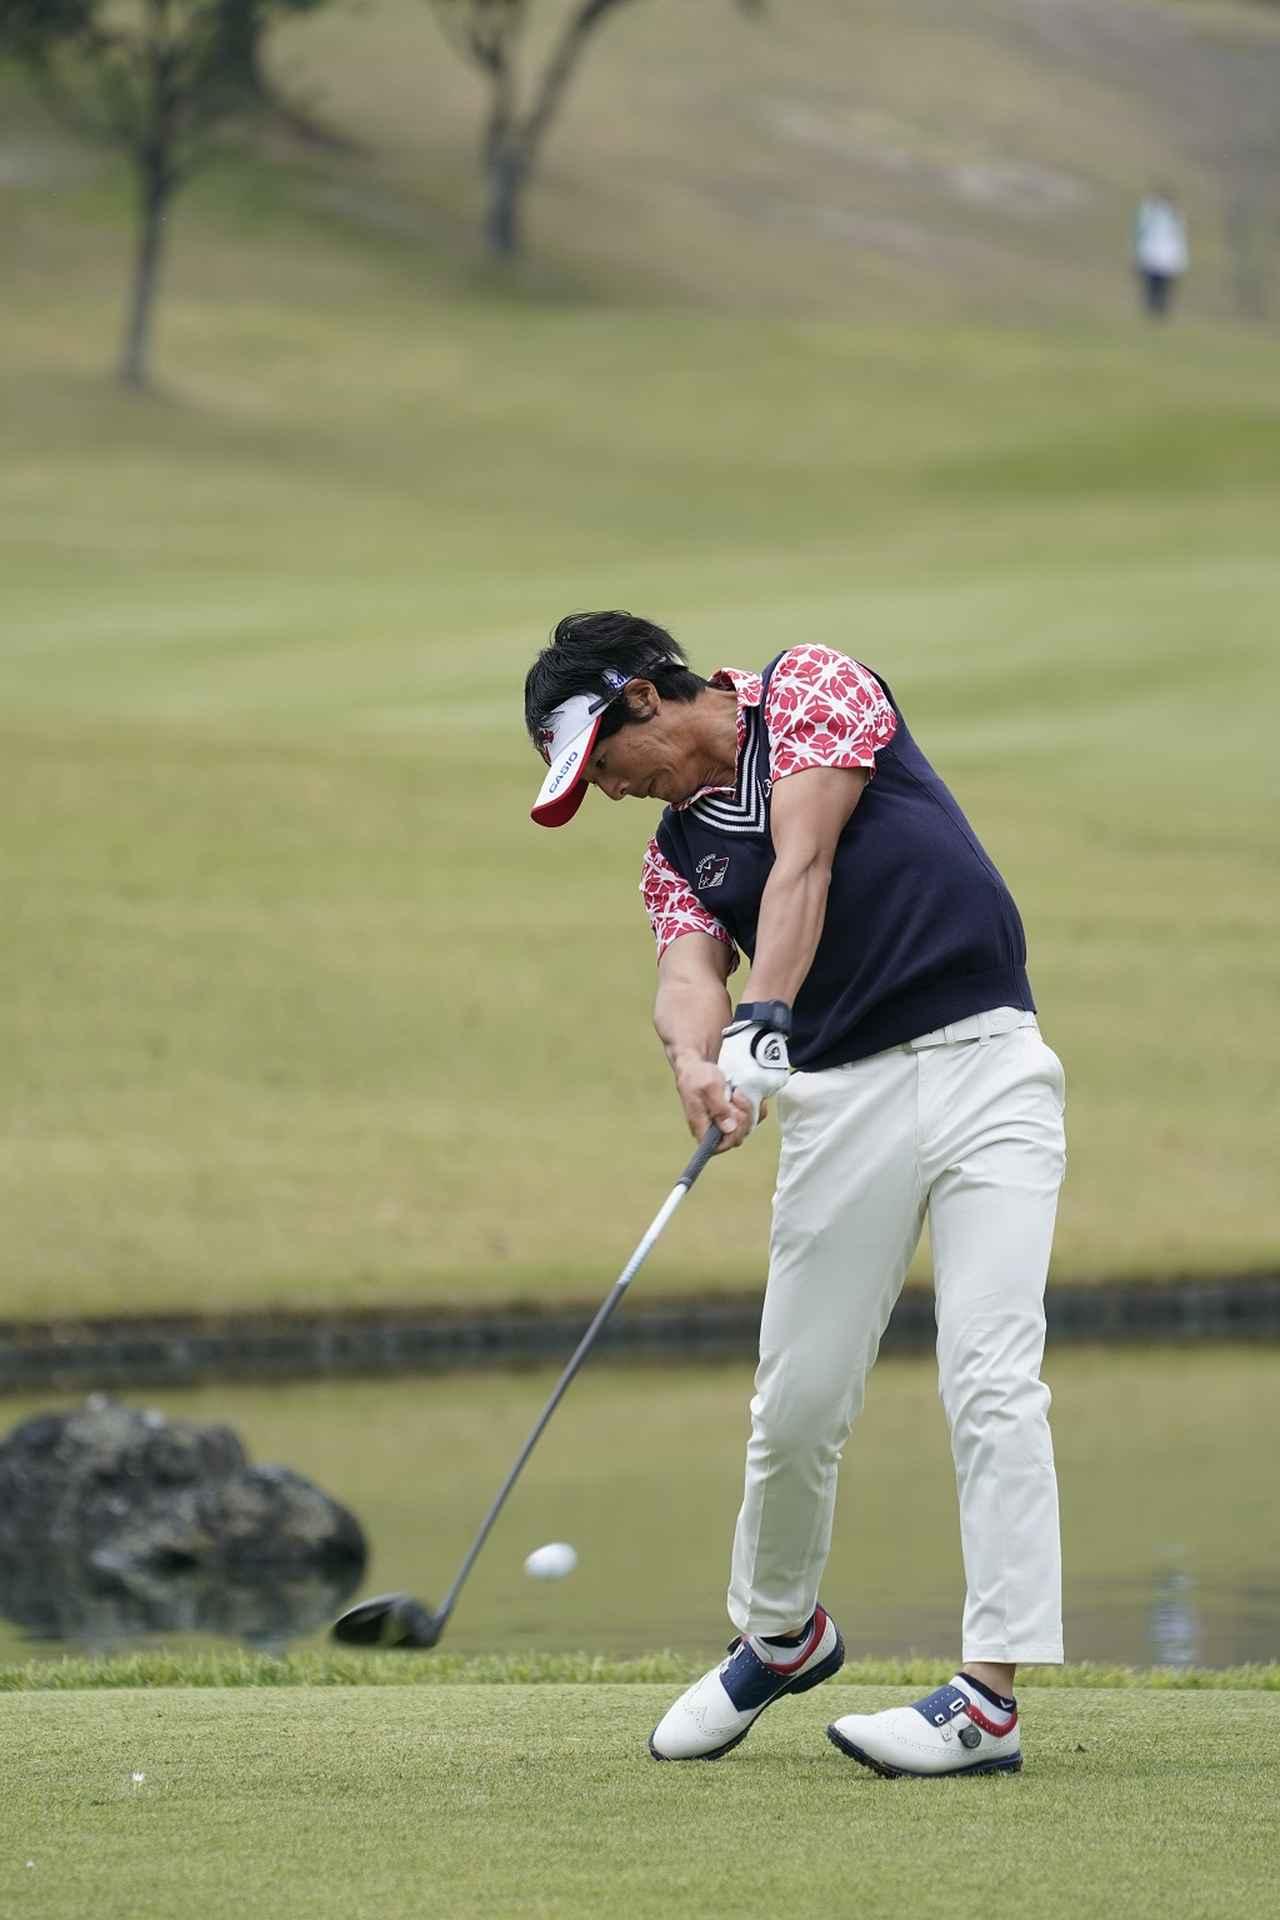 Images : 11番目の画像 - 石川遼ドライバー前方連続写真 - みんなのゴルフダイジェスト